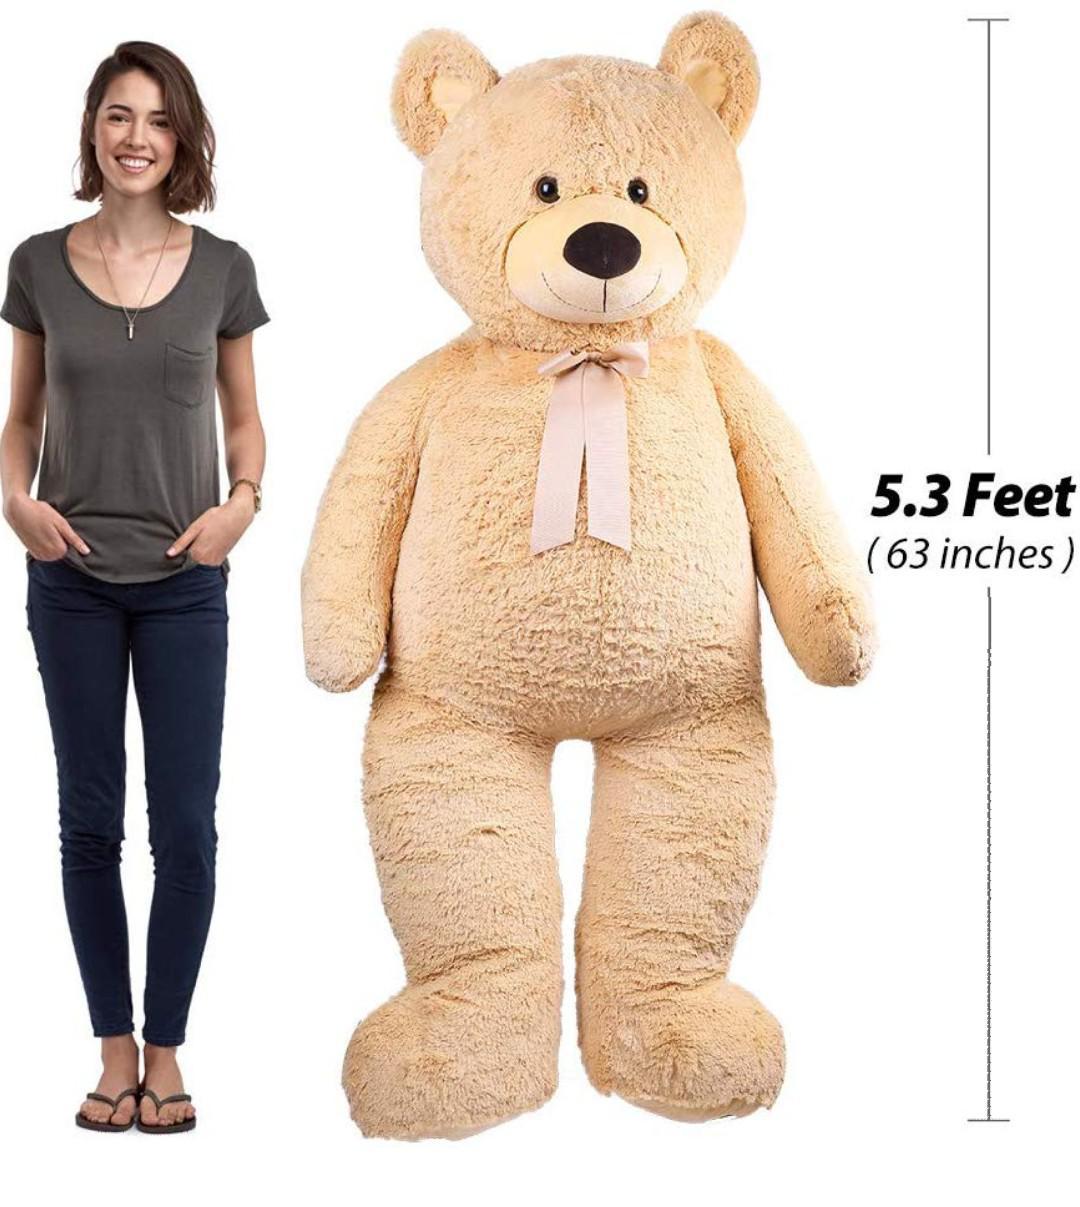 Extra Large Teddy Bear, Giant Teddy, Big Teddy, Valentine Packagr | Toys for sale in Lagos State, Nigeria